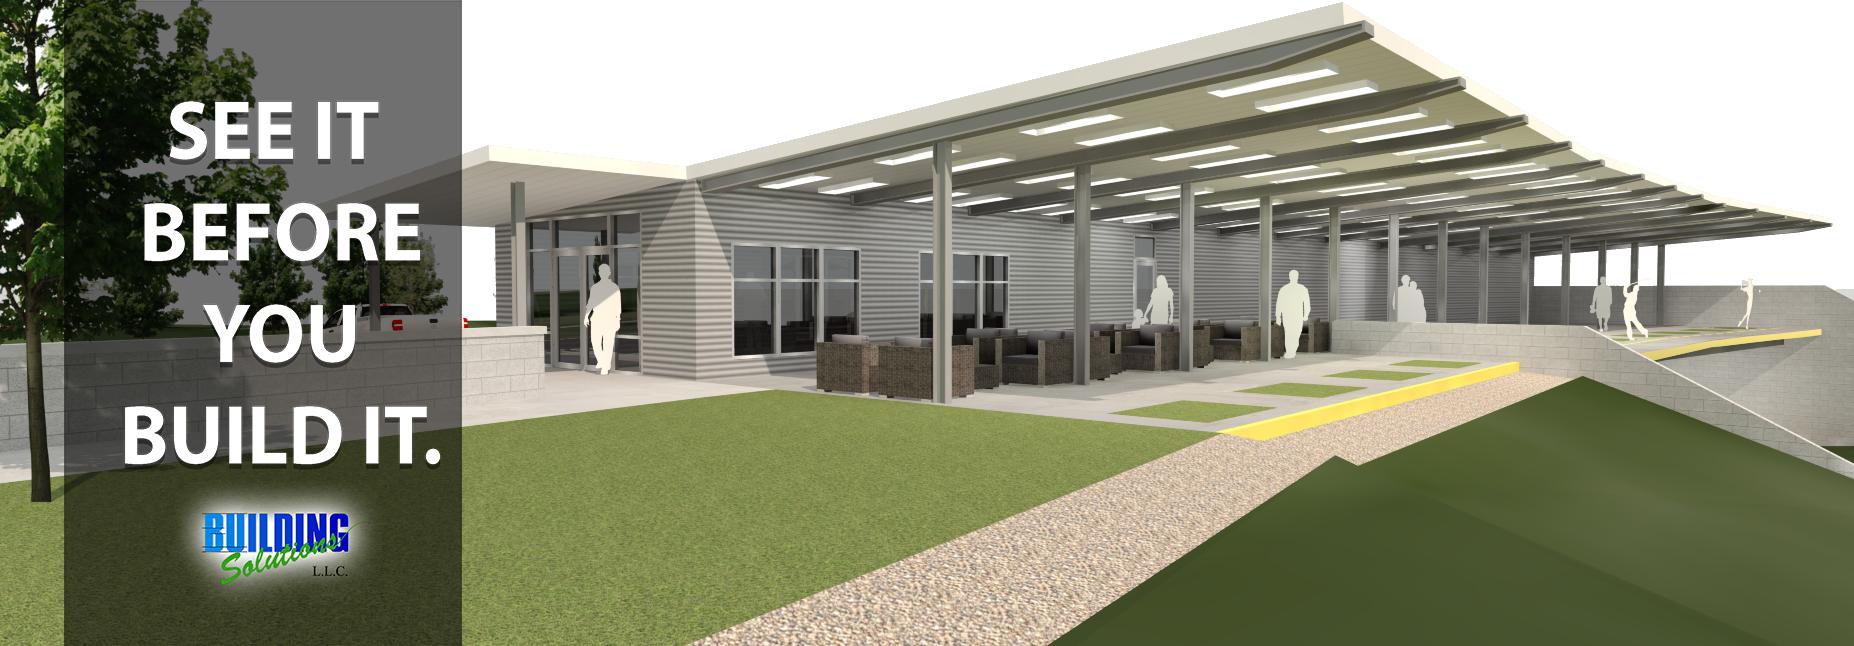 Building Solutions, LLC image 5